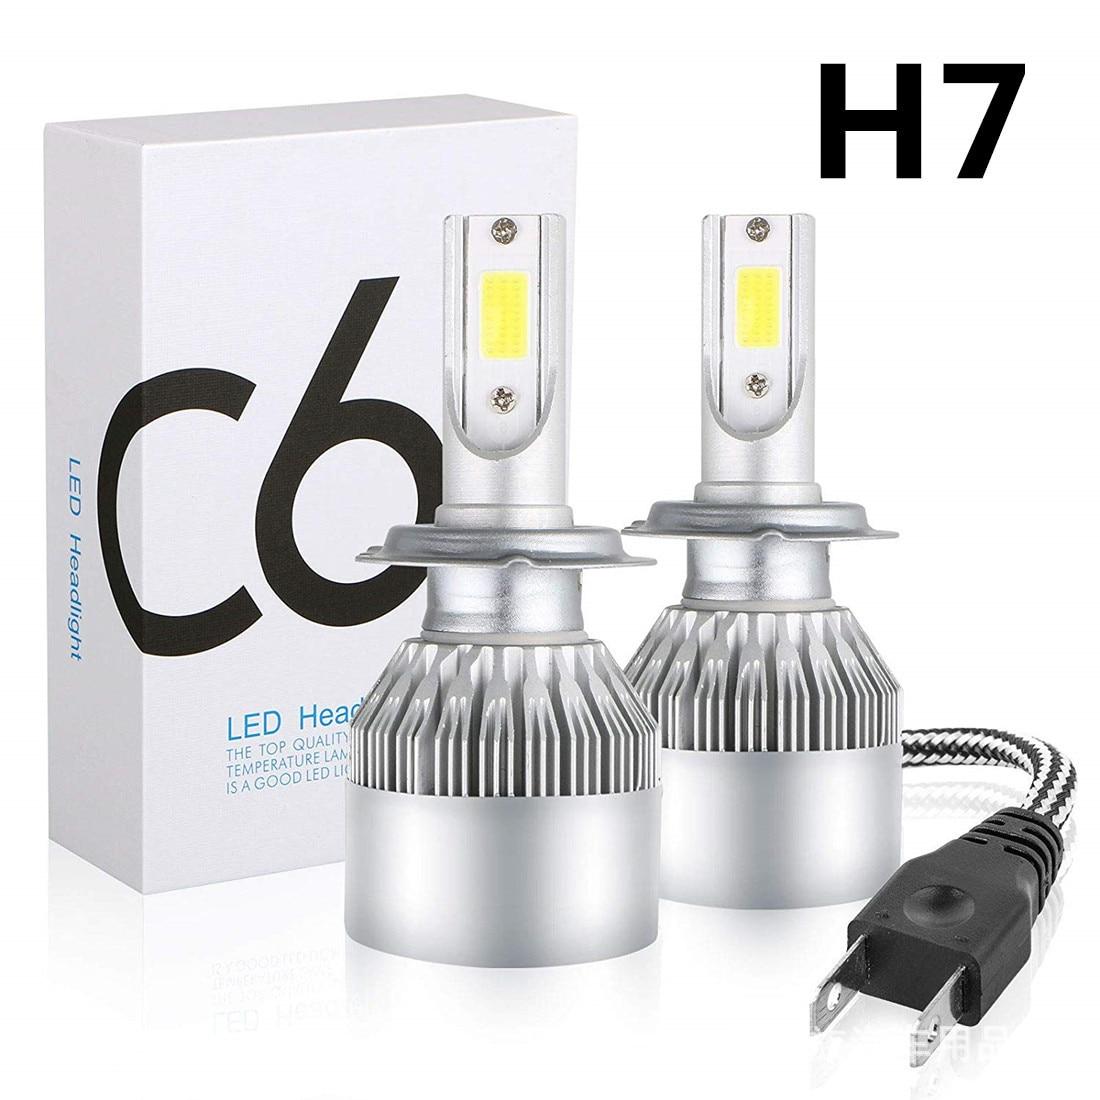 C6 H1 H3 Car Led Headlight Bulbs H7 LED Car Lights H4 880 H11 HB3 9005 HB4 9006 H13 6000K 72W 12V 7600LM Auto Headlamps 2